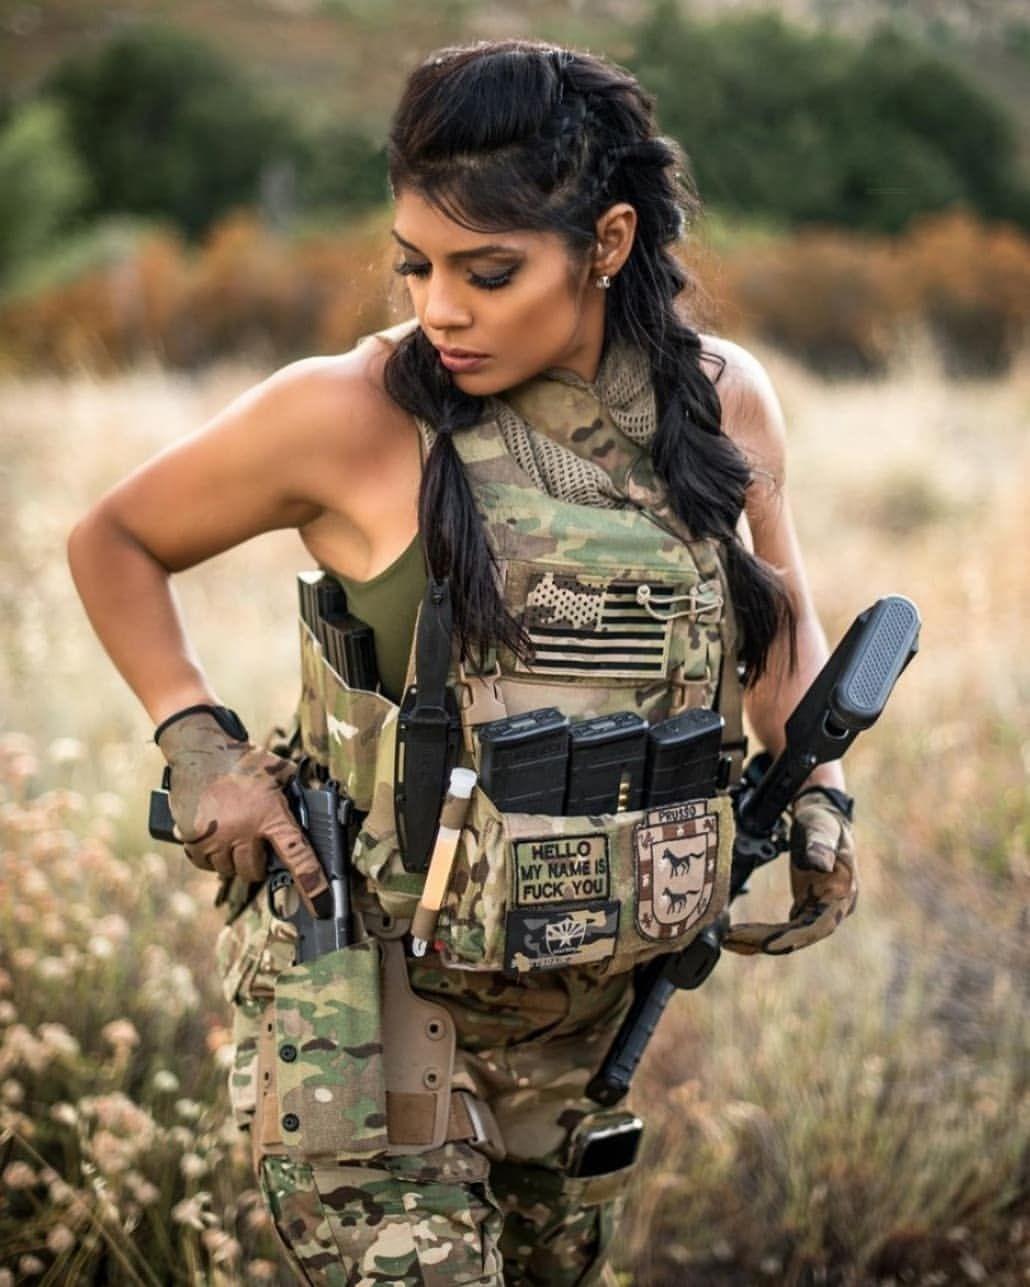 hoplite-operator | Military girl, Military women, Army girl